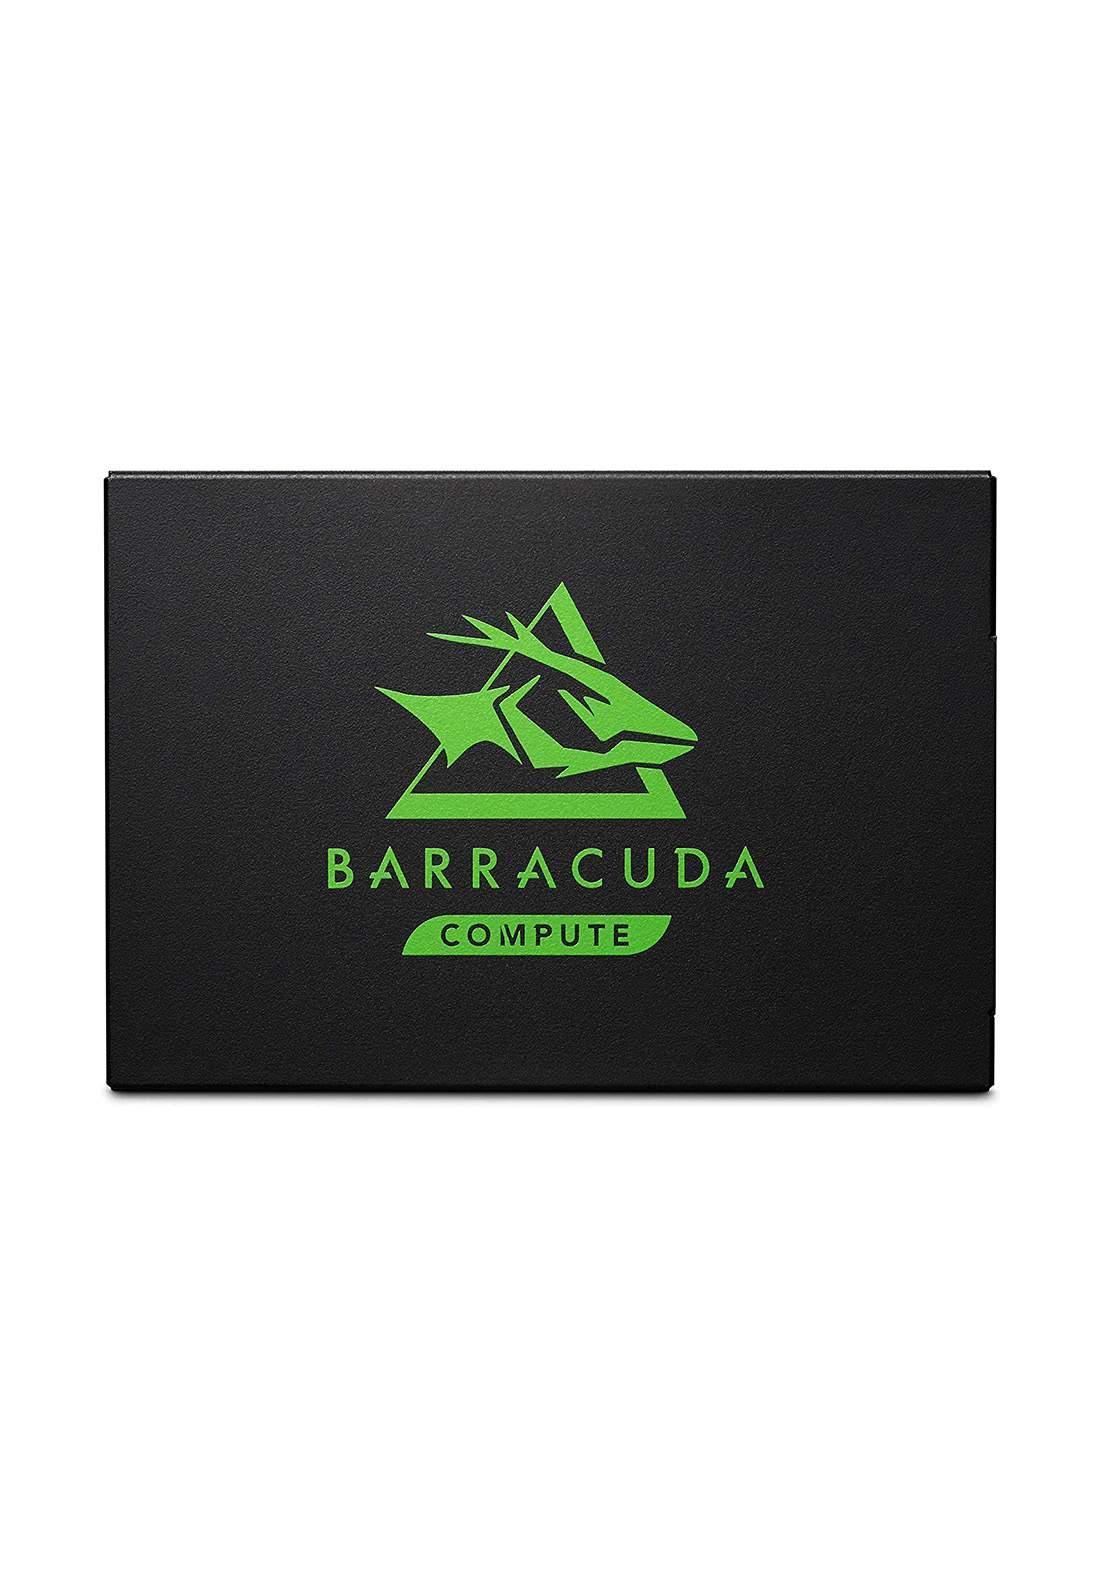 Seagate Barracuda 2.5 Inch 250GB 3D TLC Internal Solid State Drive هارد داخلي